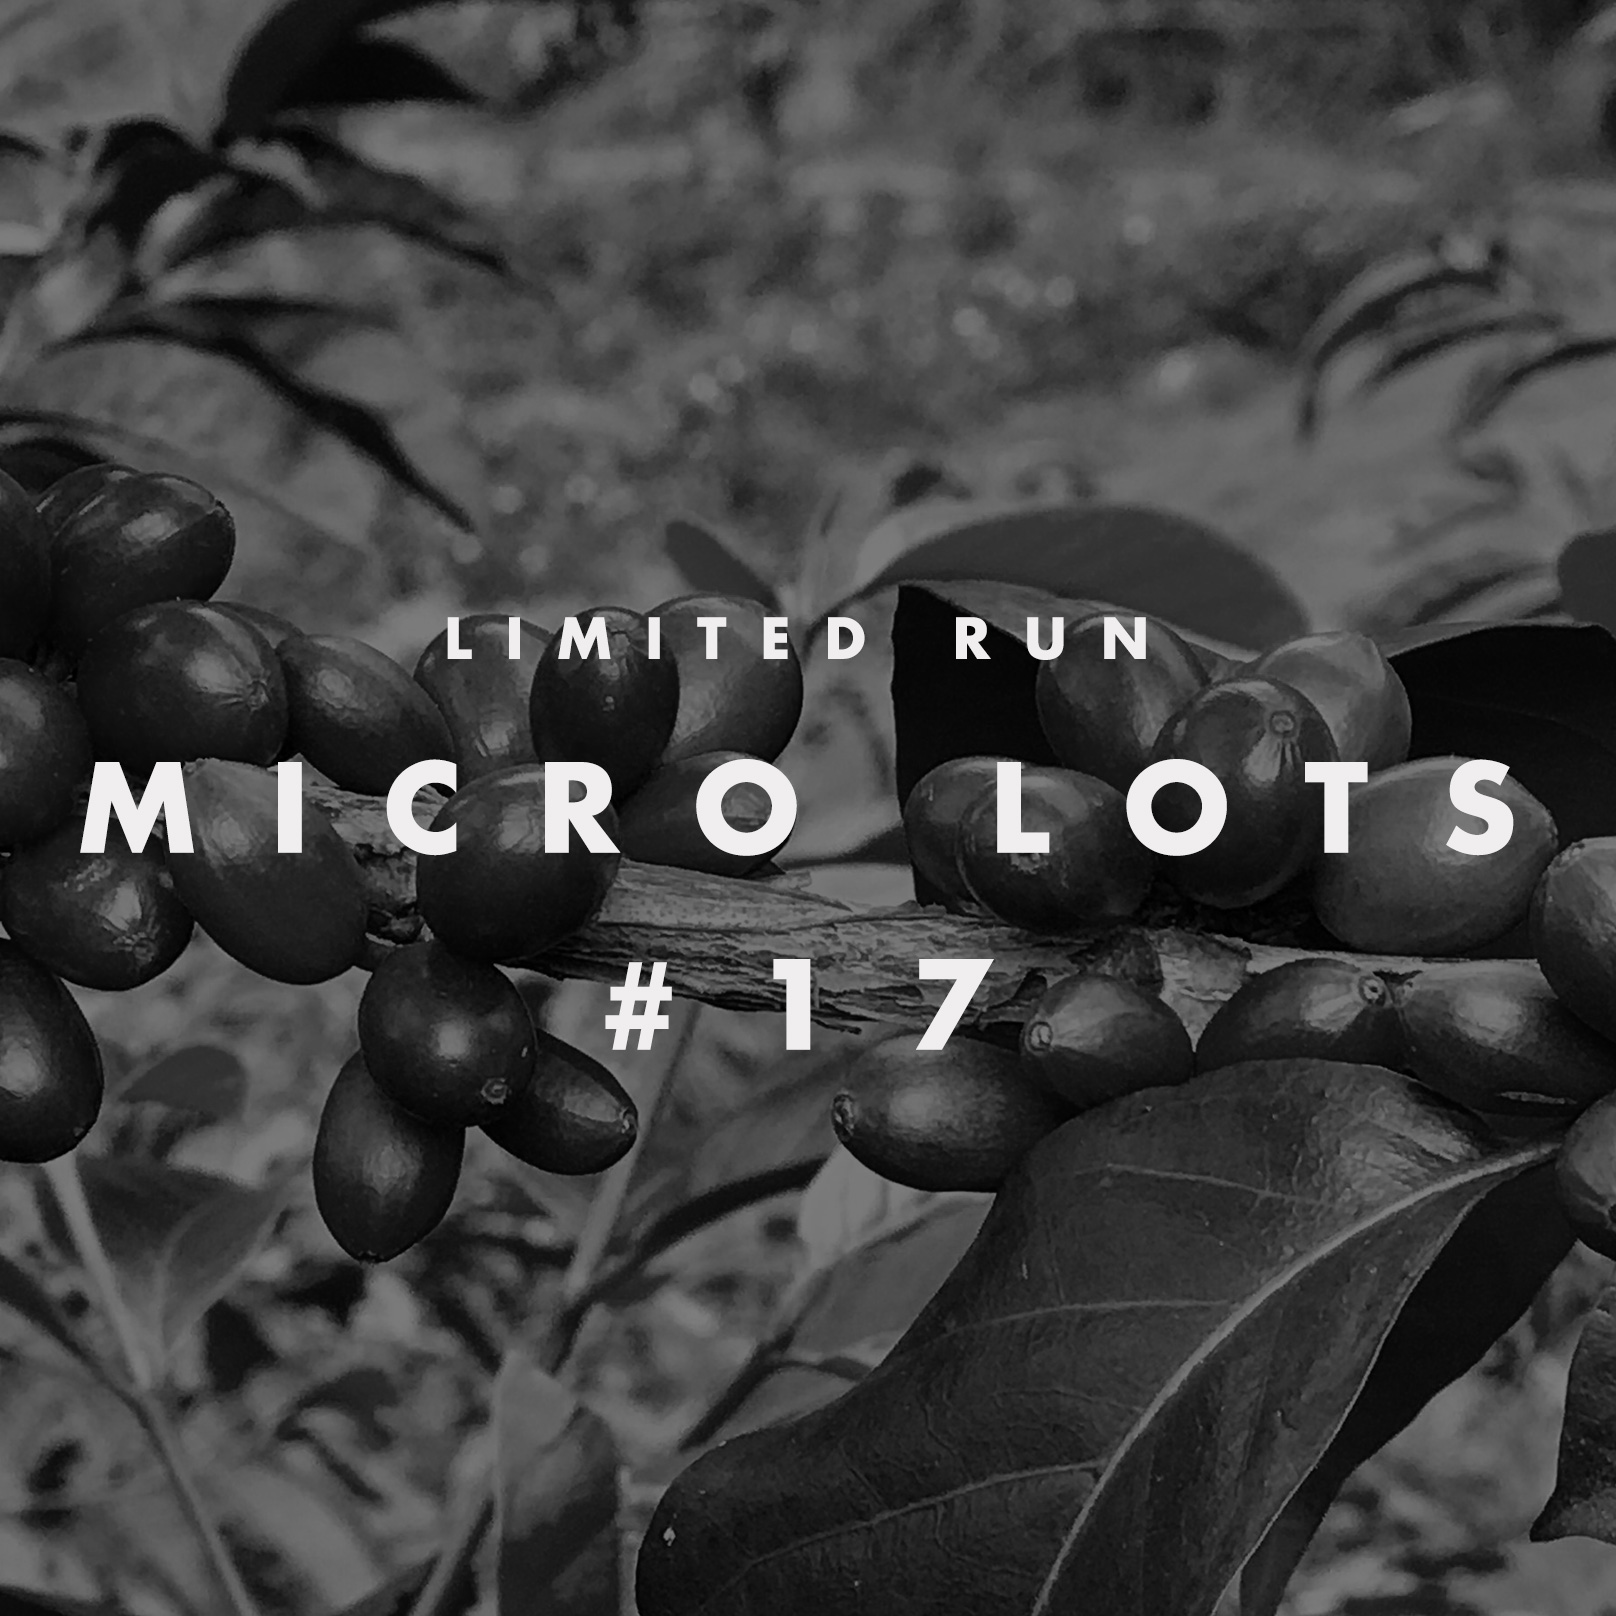 microlot2.jpg